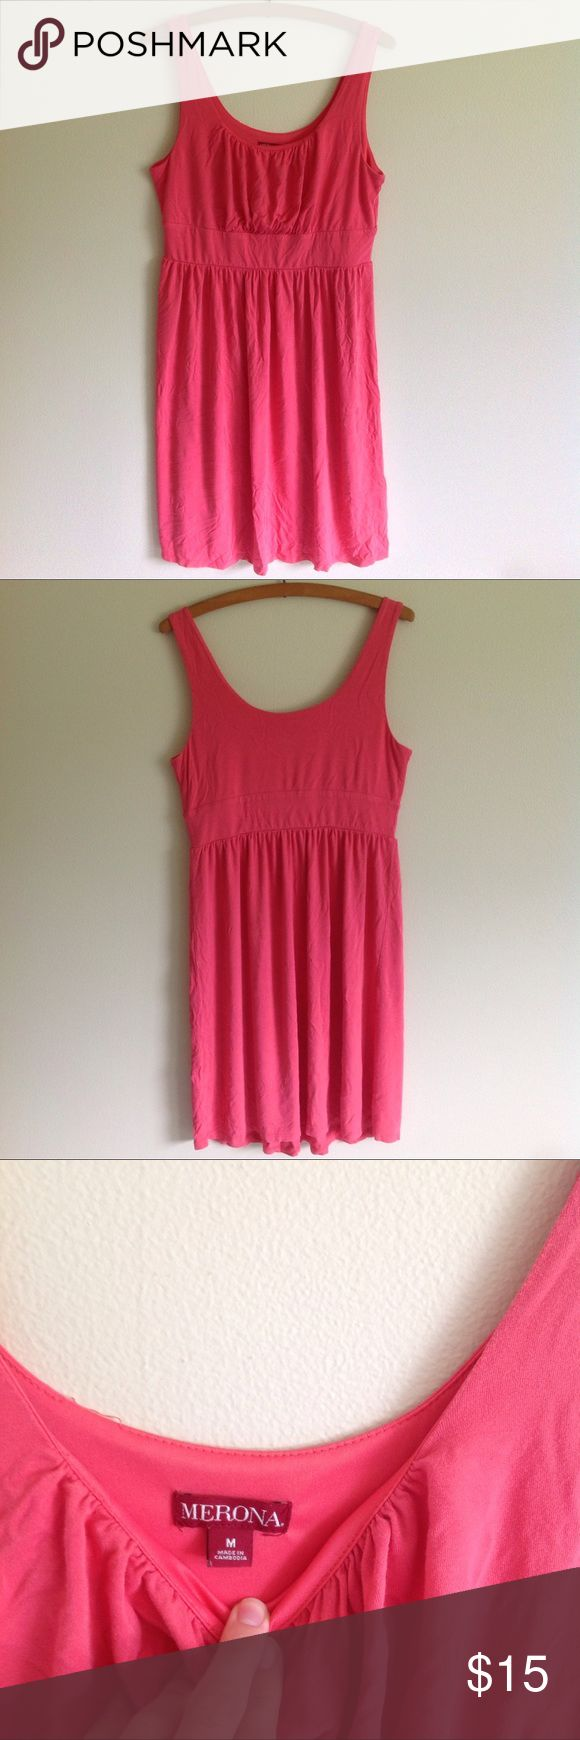 Merona Coral Summer Dress Merona coral summer dress, size medium, excellent condition, perfect for the summer! Merona Dresses Mini